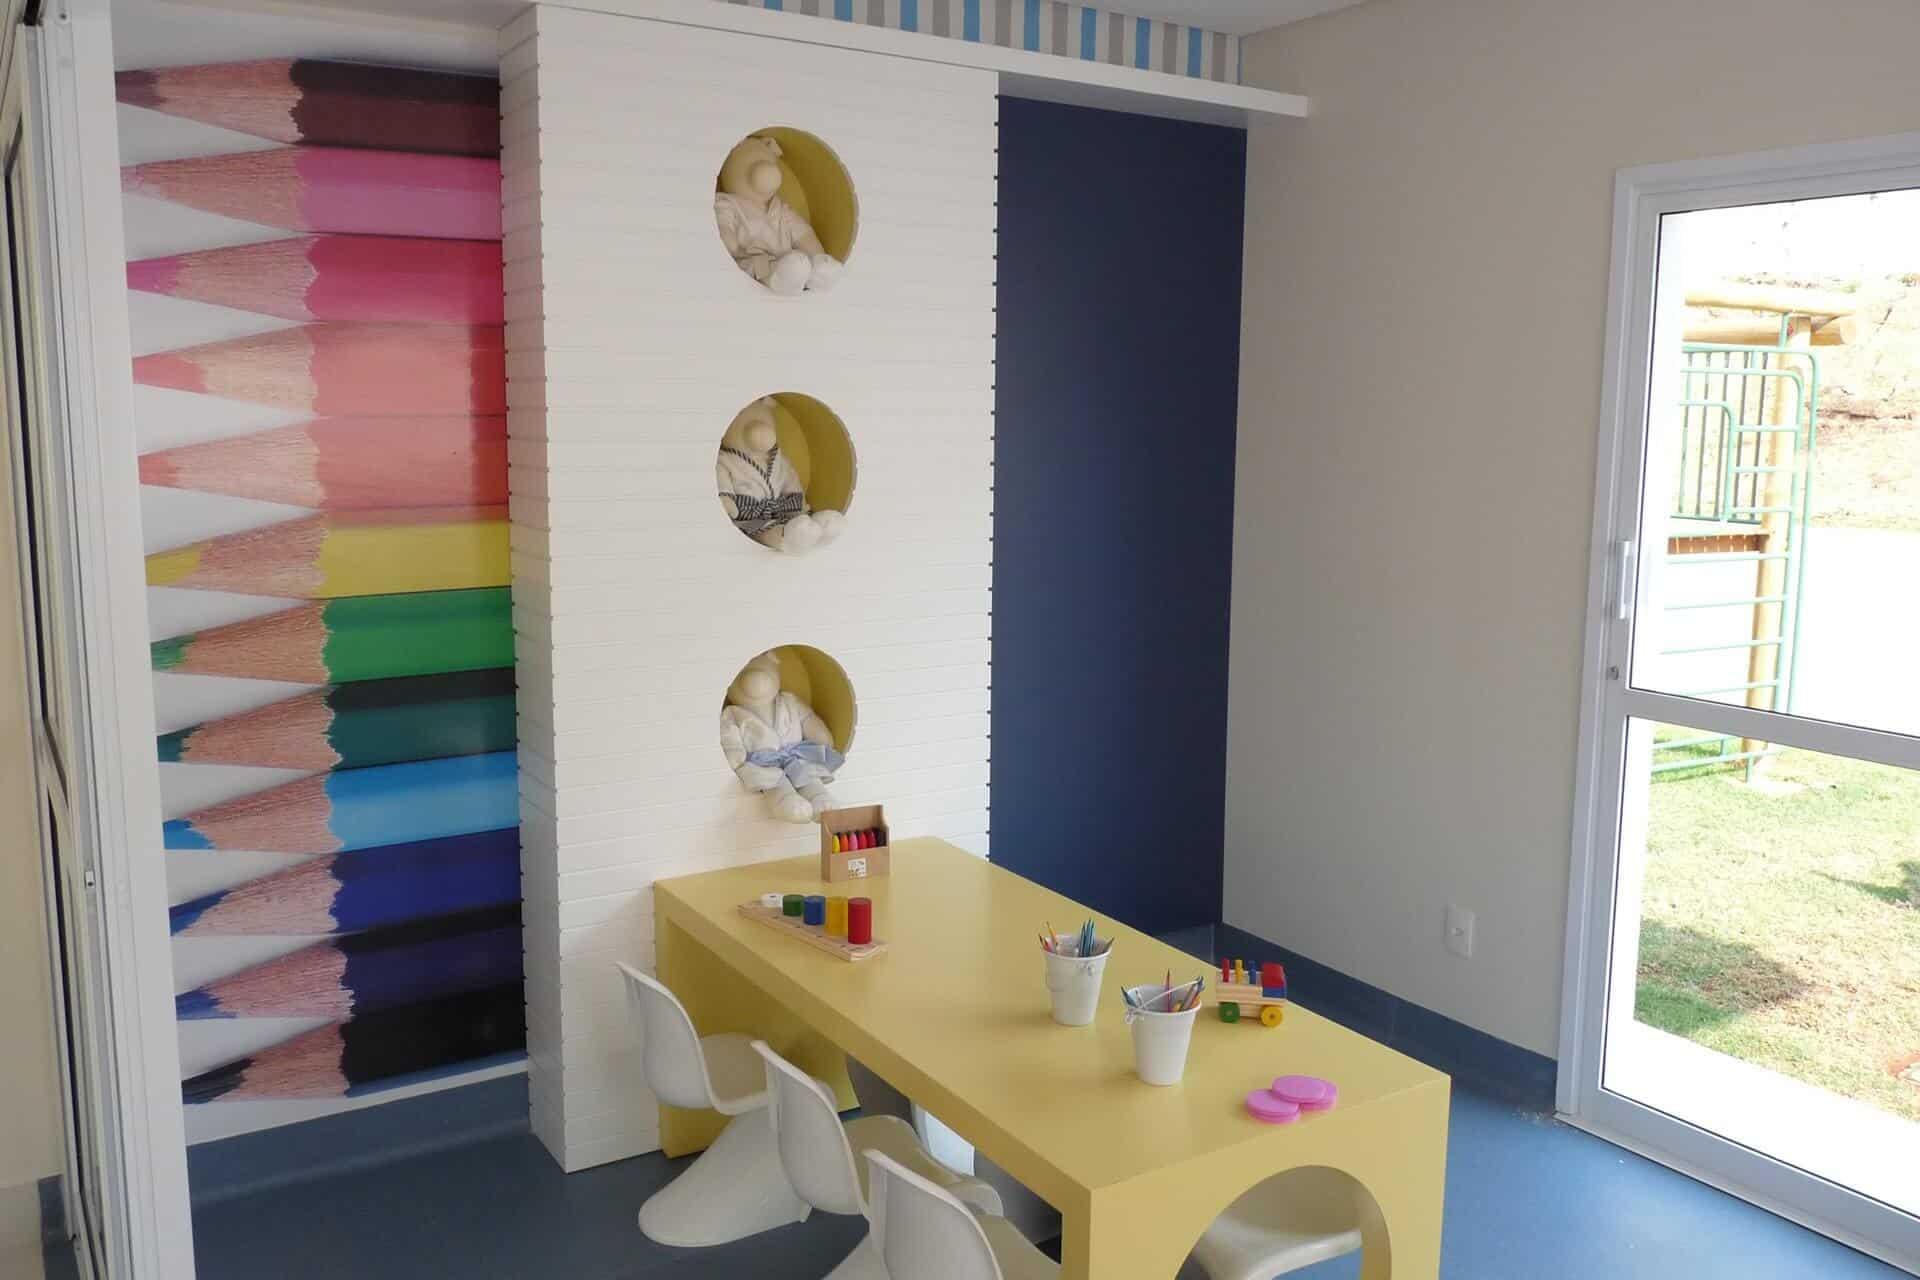 dormitorio-planejado_moveis-sob-medida-galeria-144